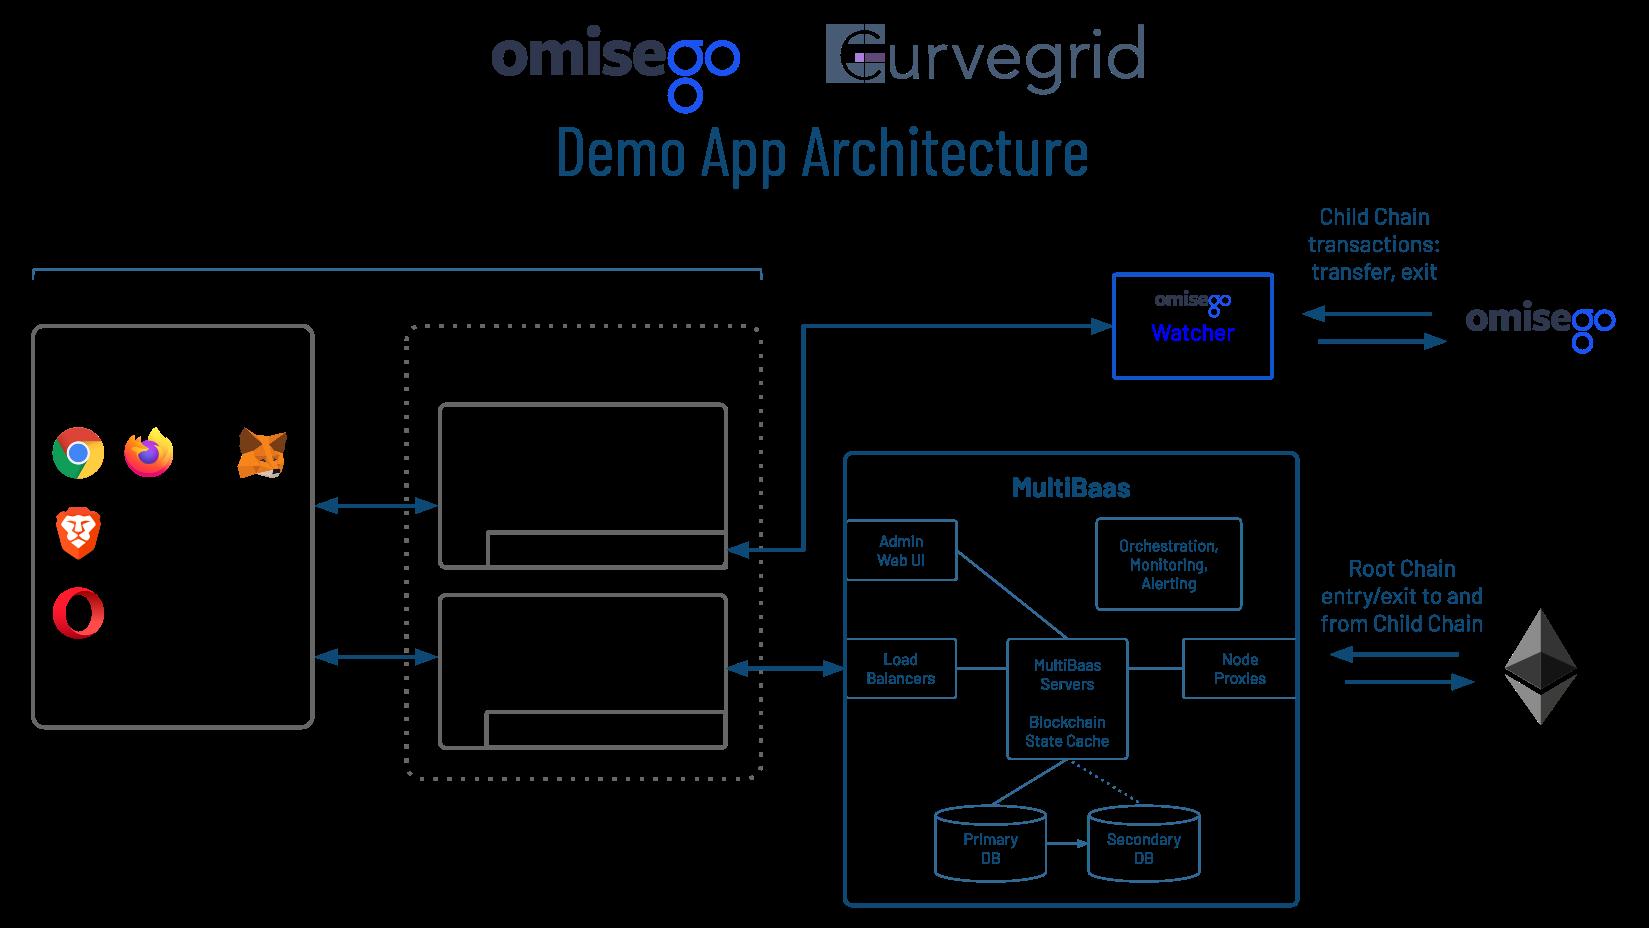 OmiseGO MultiBaas demo app architecture